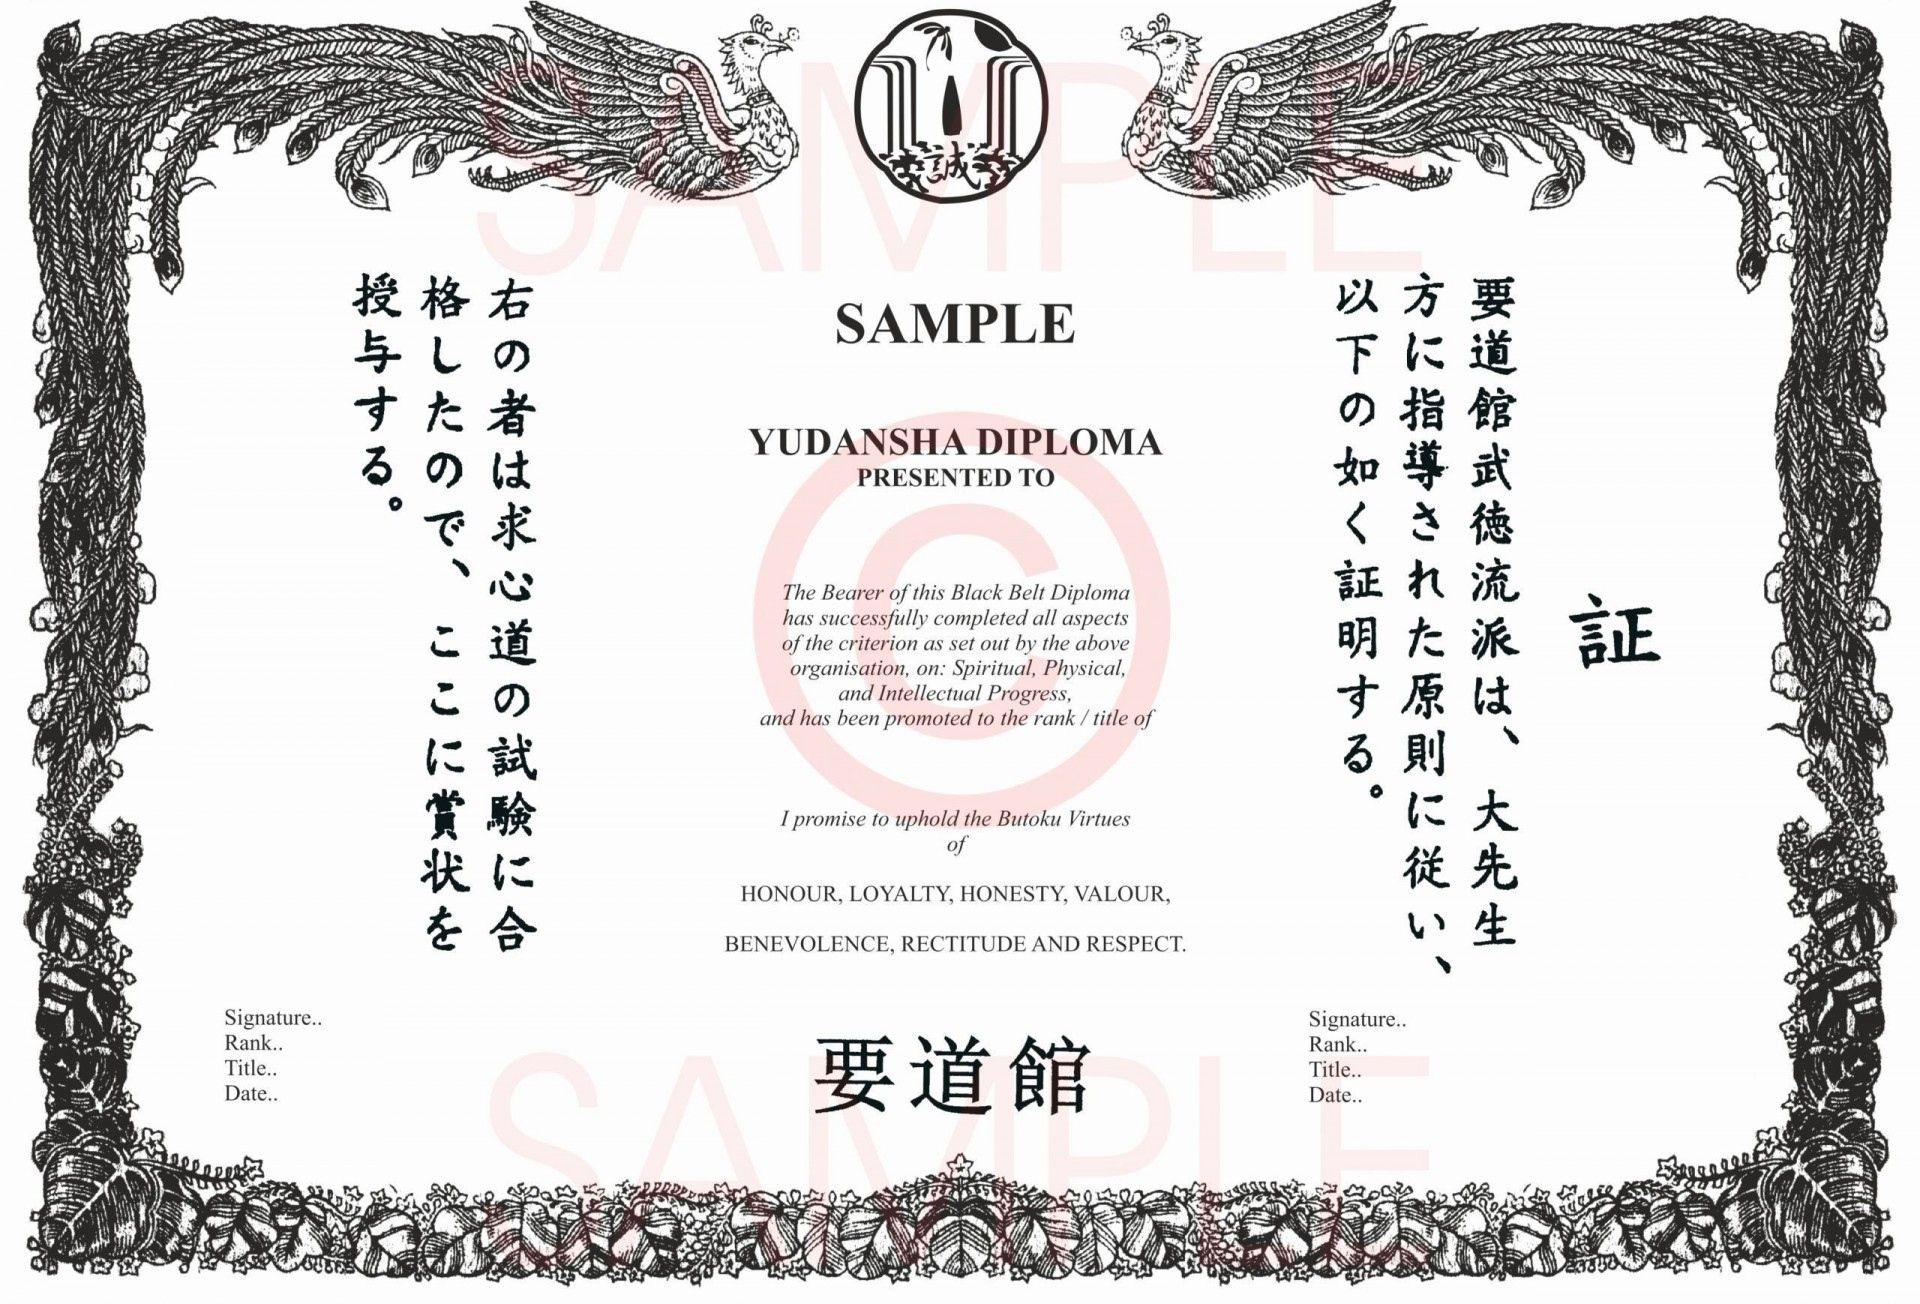 Best Martial Arts Certificate Templates In 2021 Certificate Templates Best Martial Arts Art Certificate Free black belt certificate template